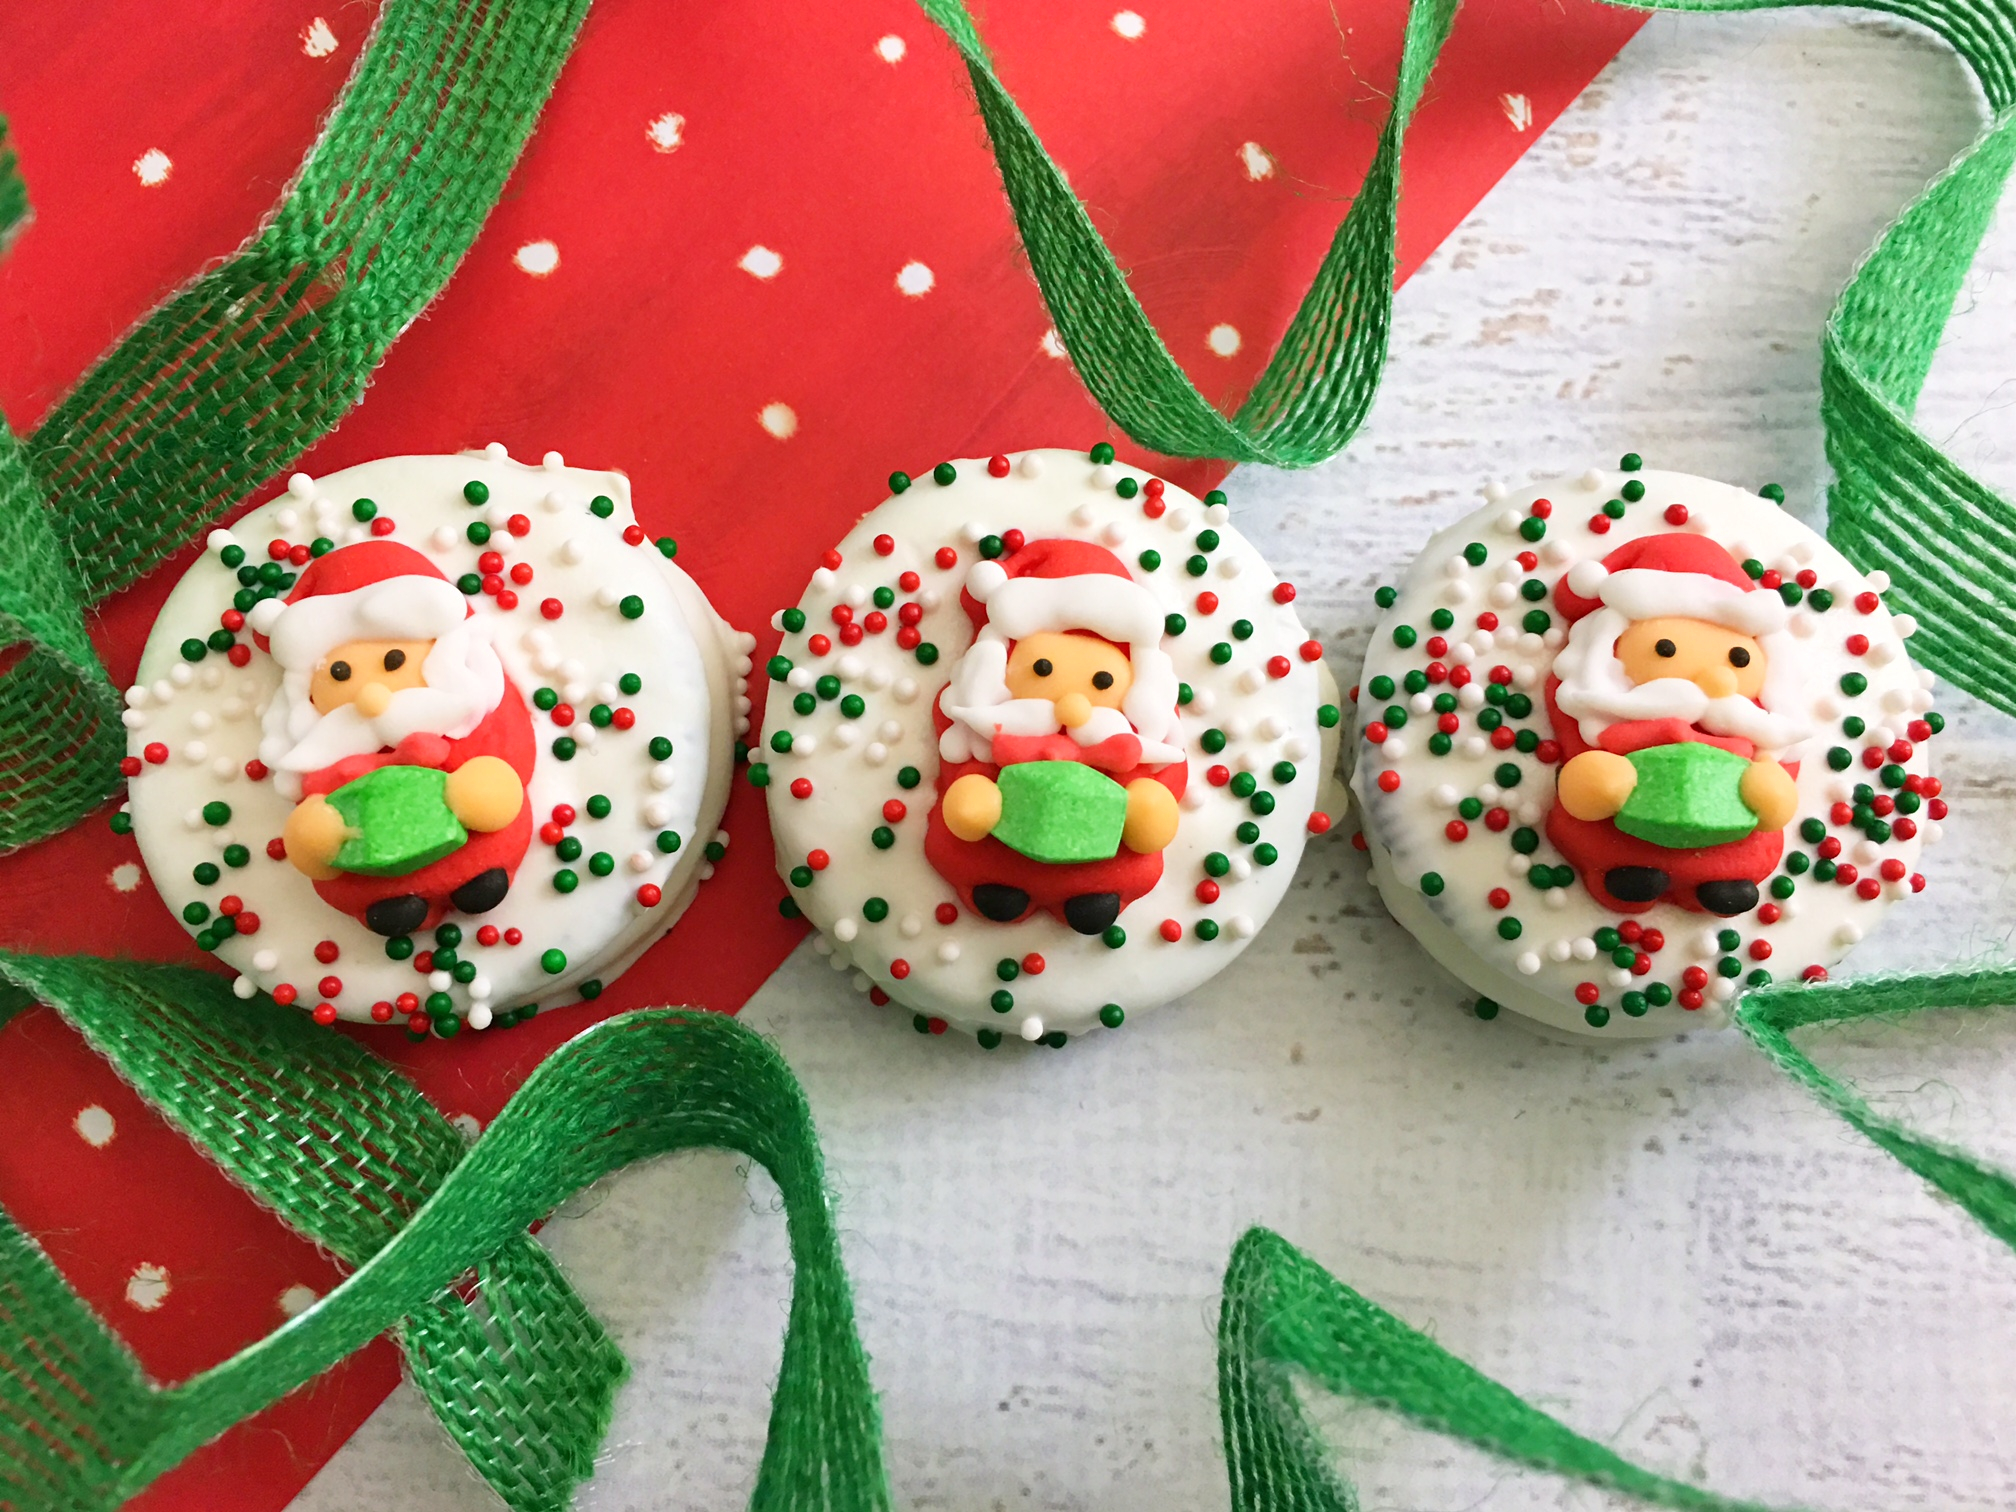 Oreo Christmas Cookies, Holiday Cookies, Santa Christmas Cookies, Dipped Oreo Cookies, Festive Christmas Cookies, Holiday Baking